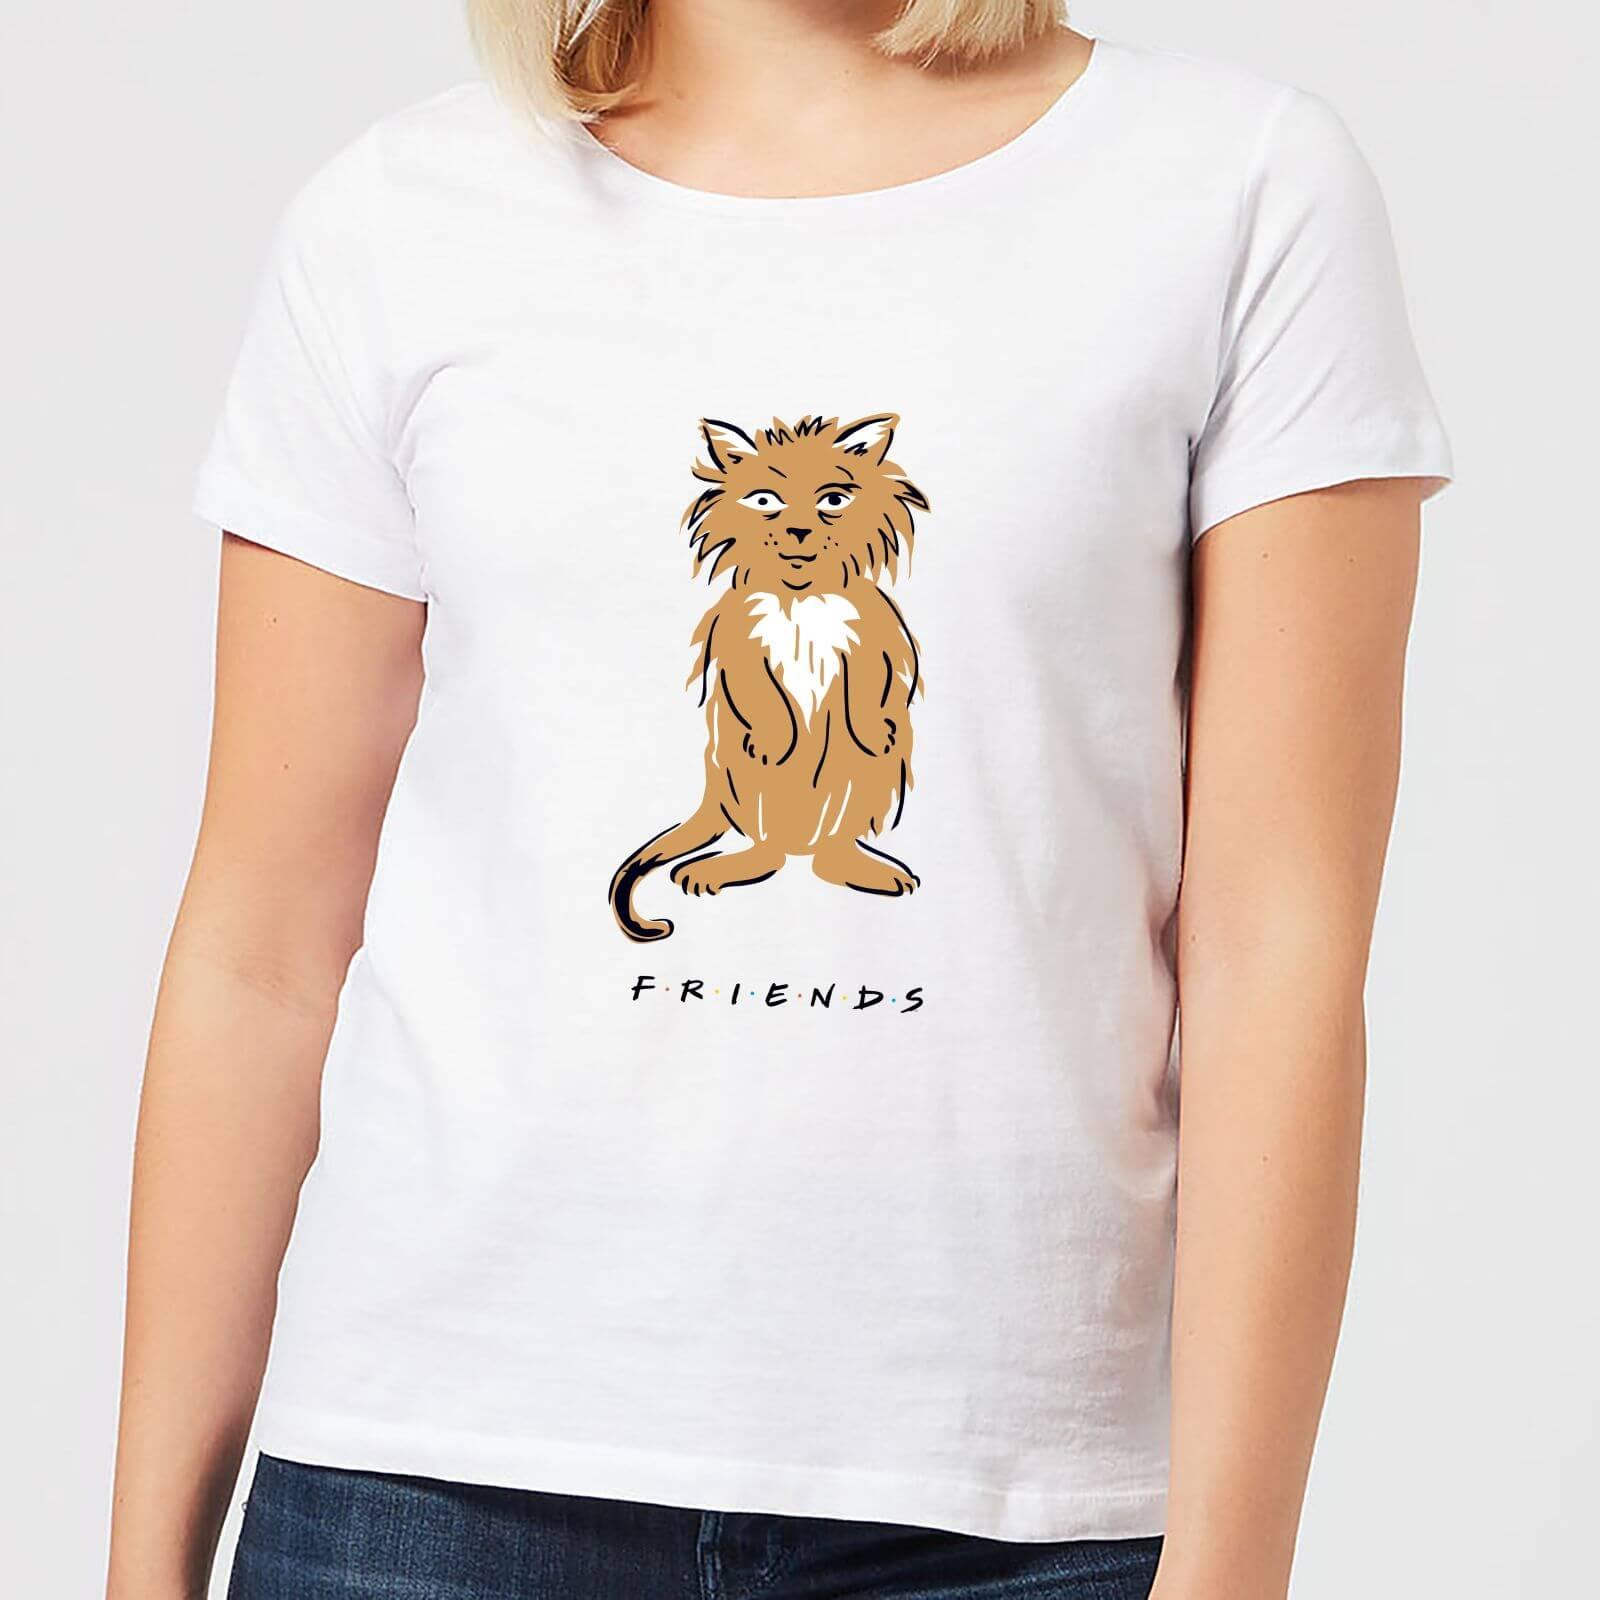 Friends Smelly Cat Women's T-Shirt - White - XL - White